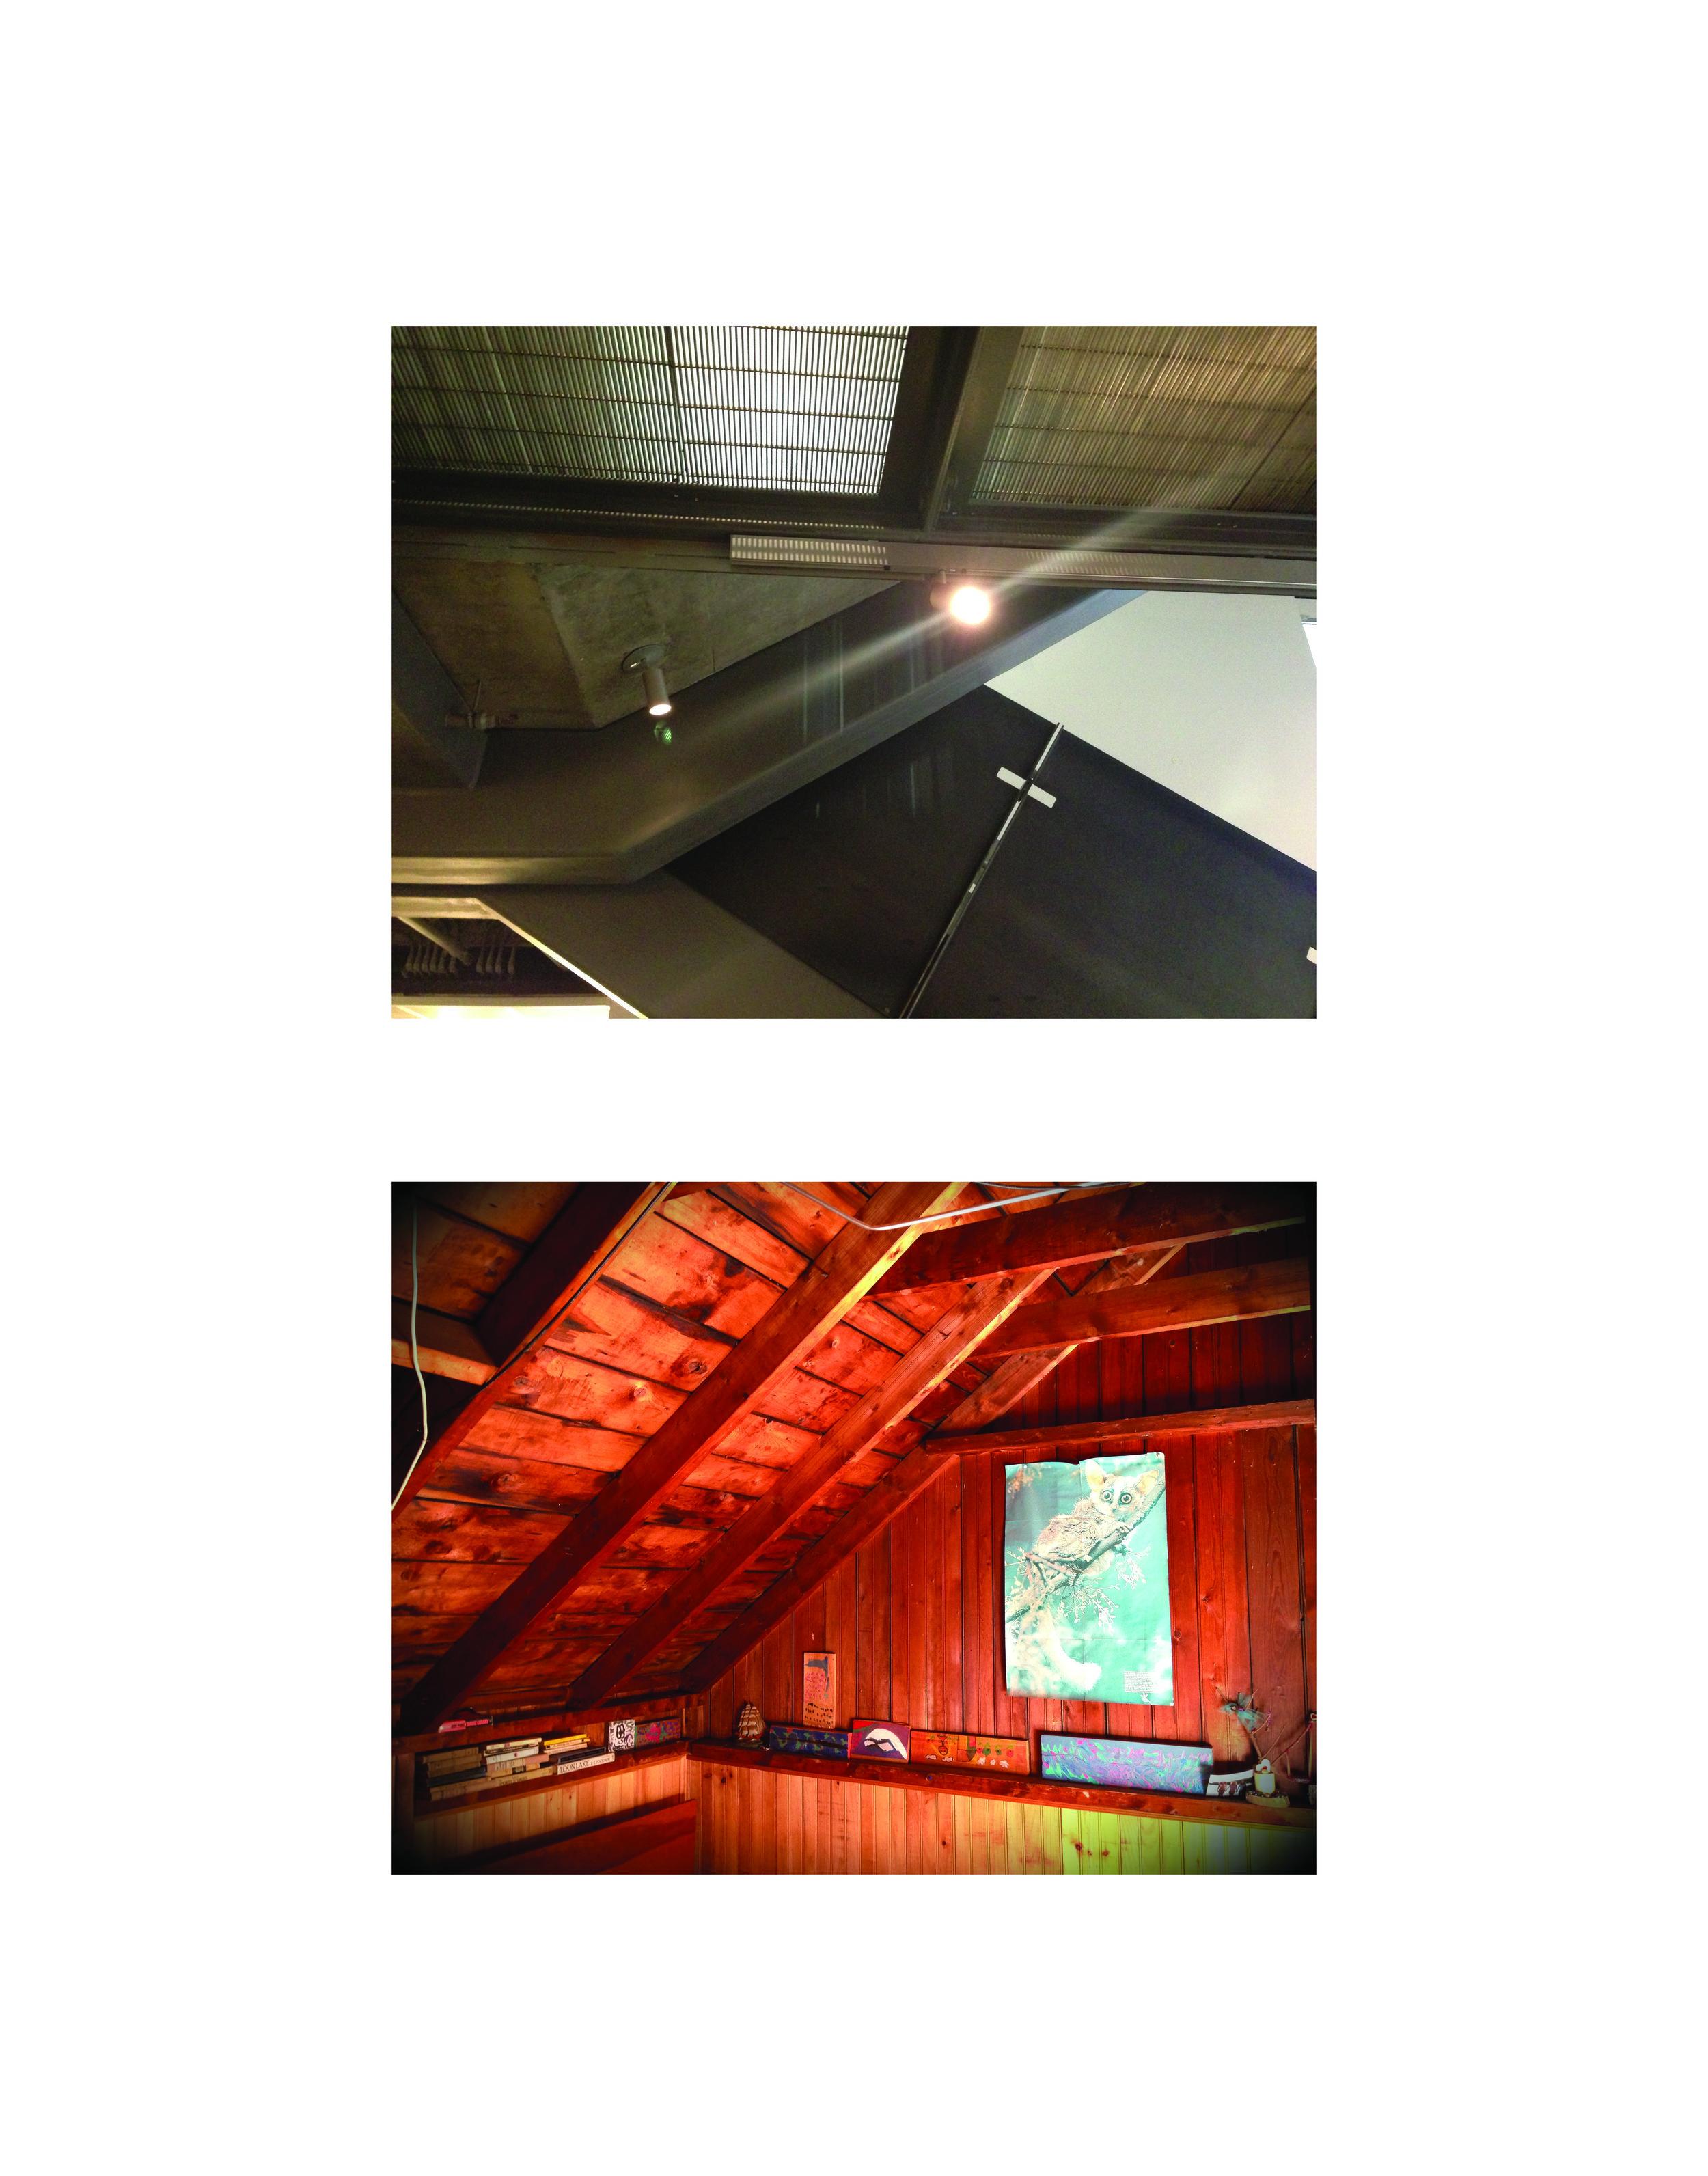 Cabin Grannof Contrast_Page_04.jpg